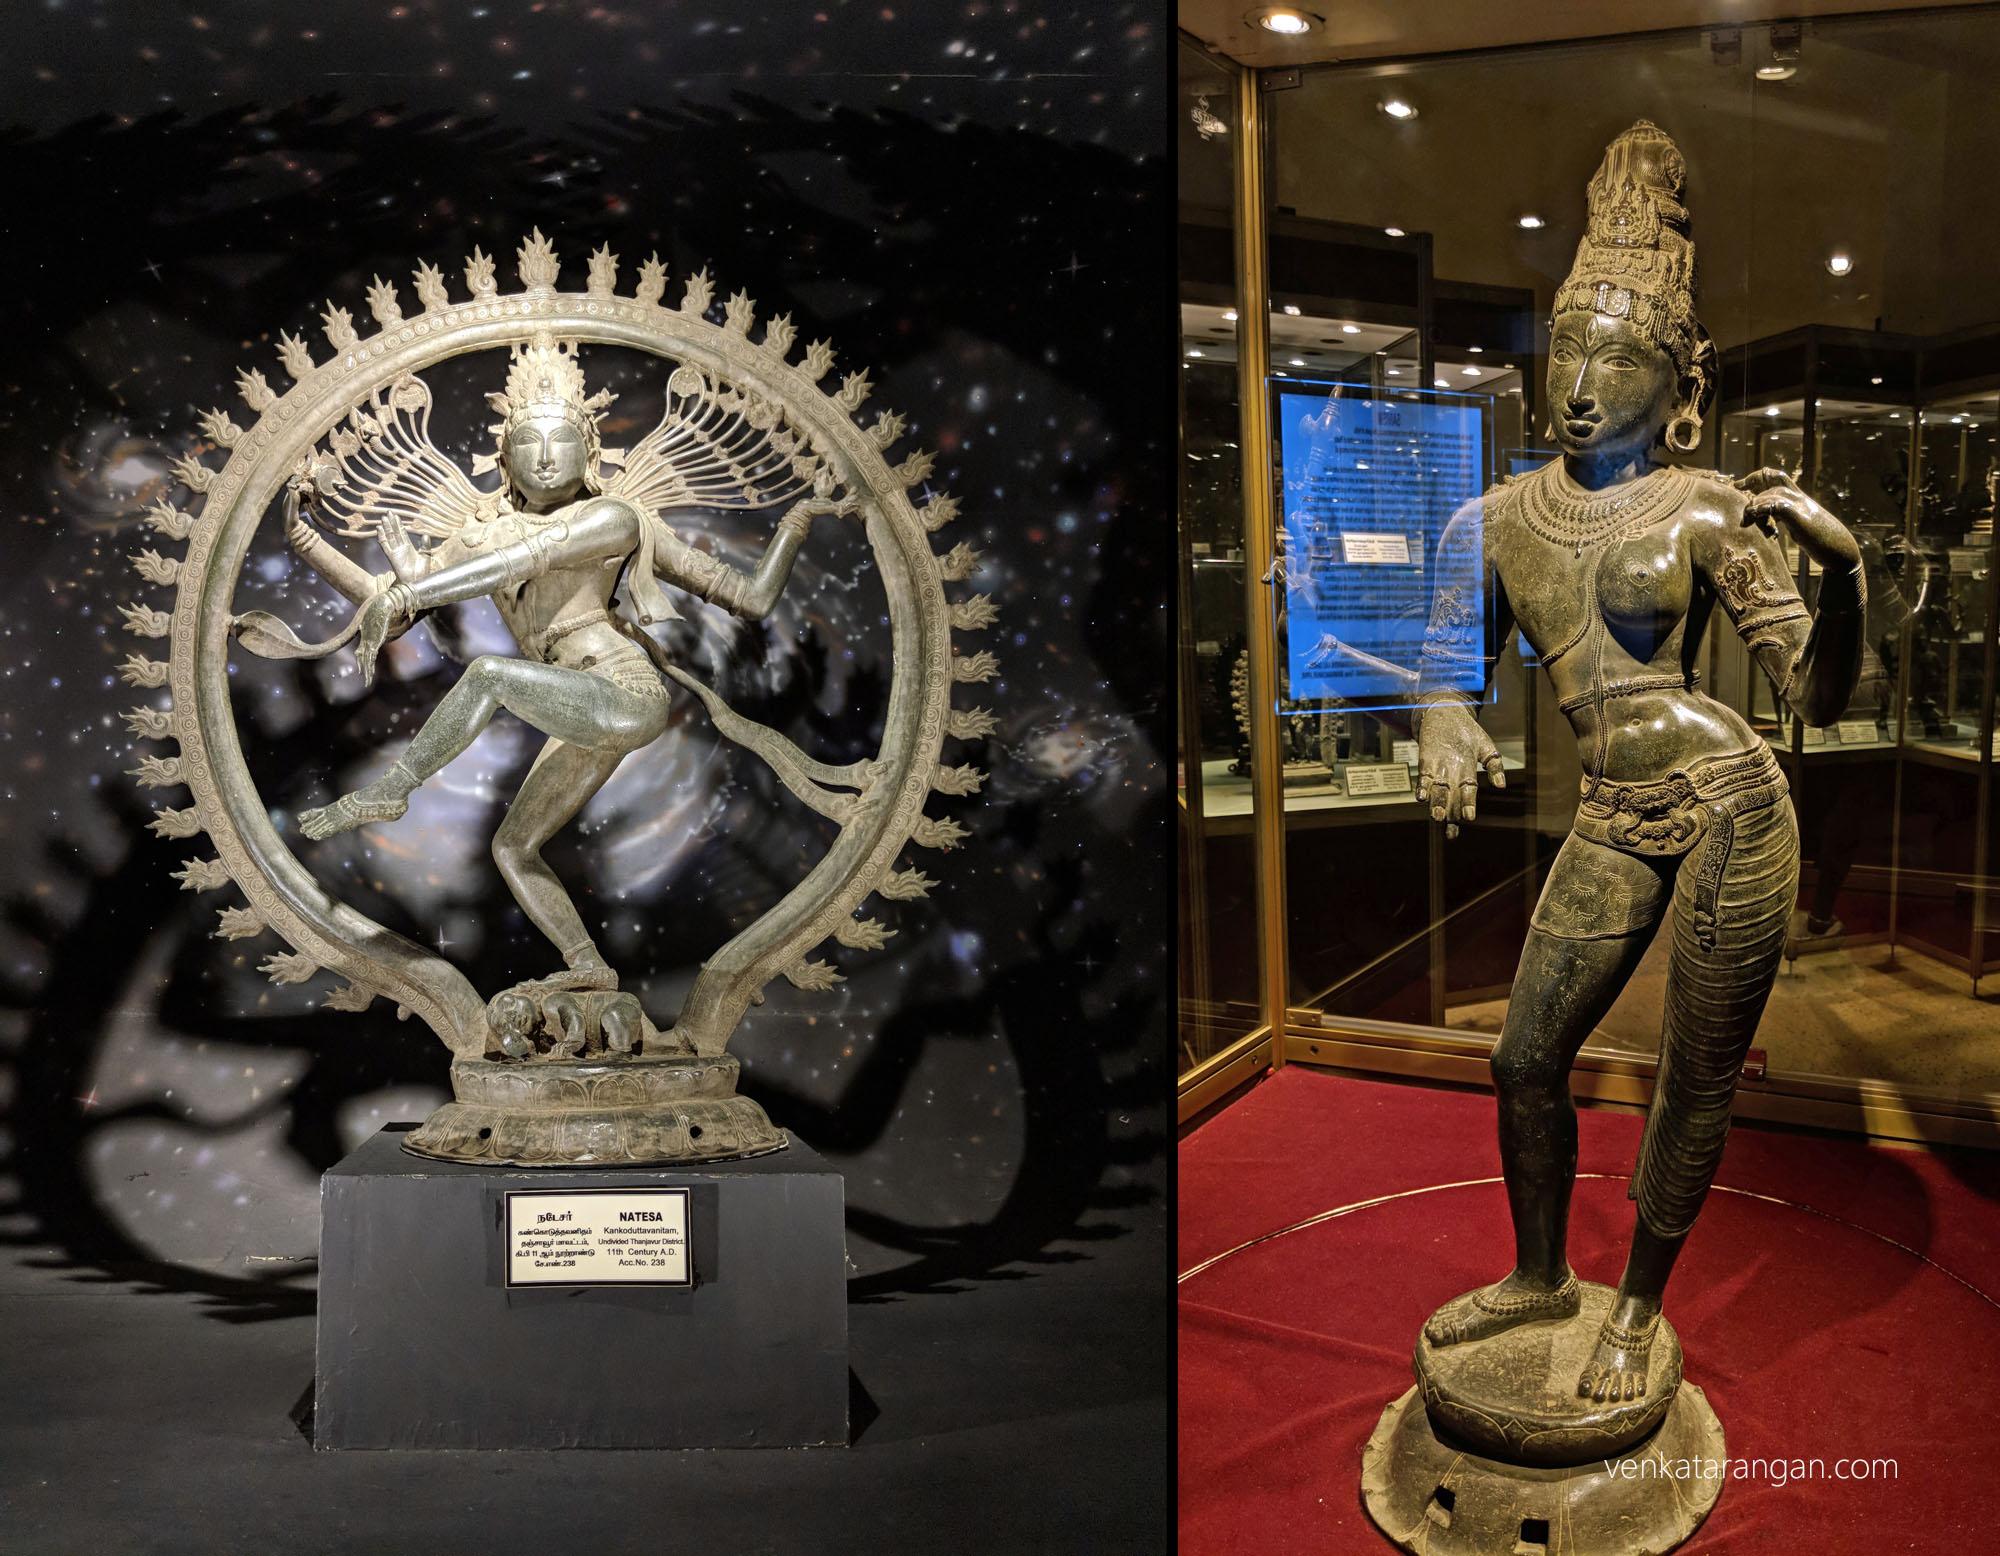 Left-Natesa,கண்கொடுத்தவனிதம், தஞ்சாவூர். 11th Century.